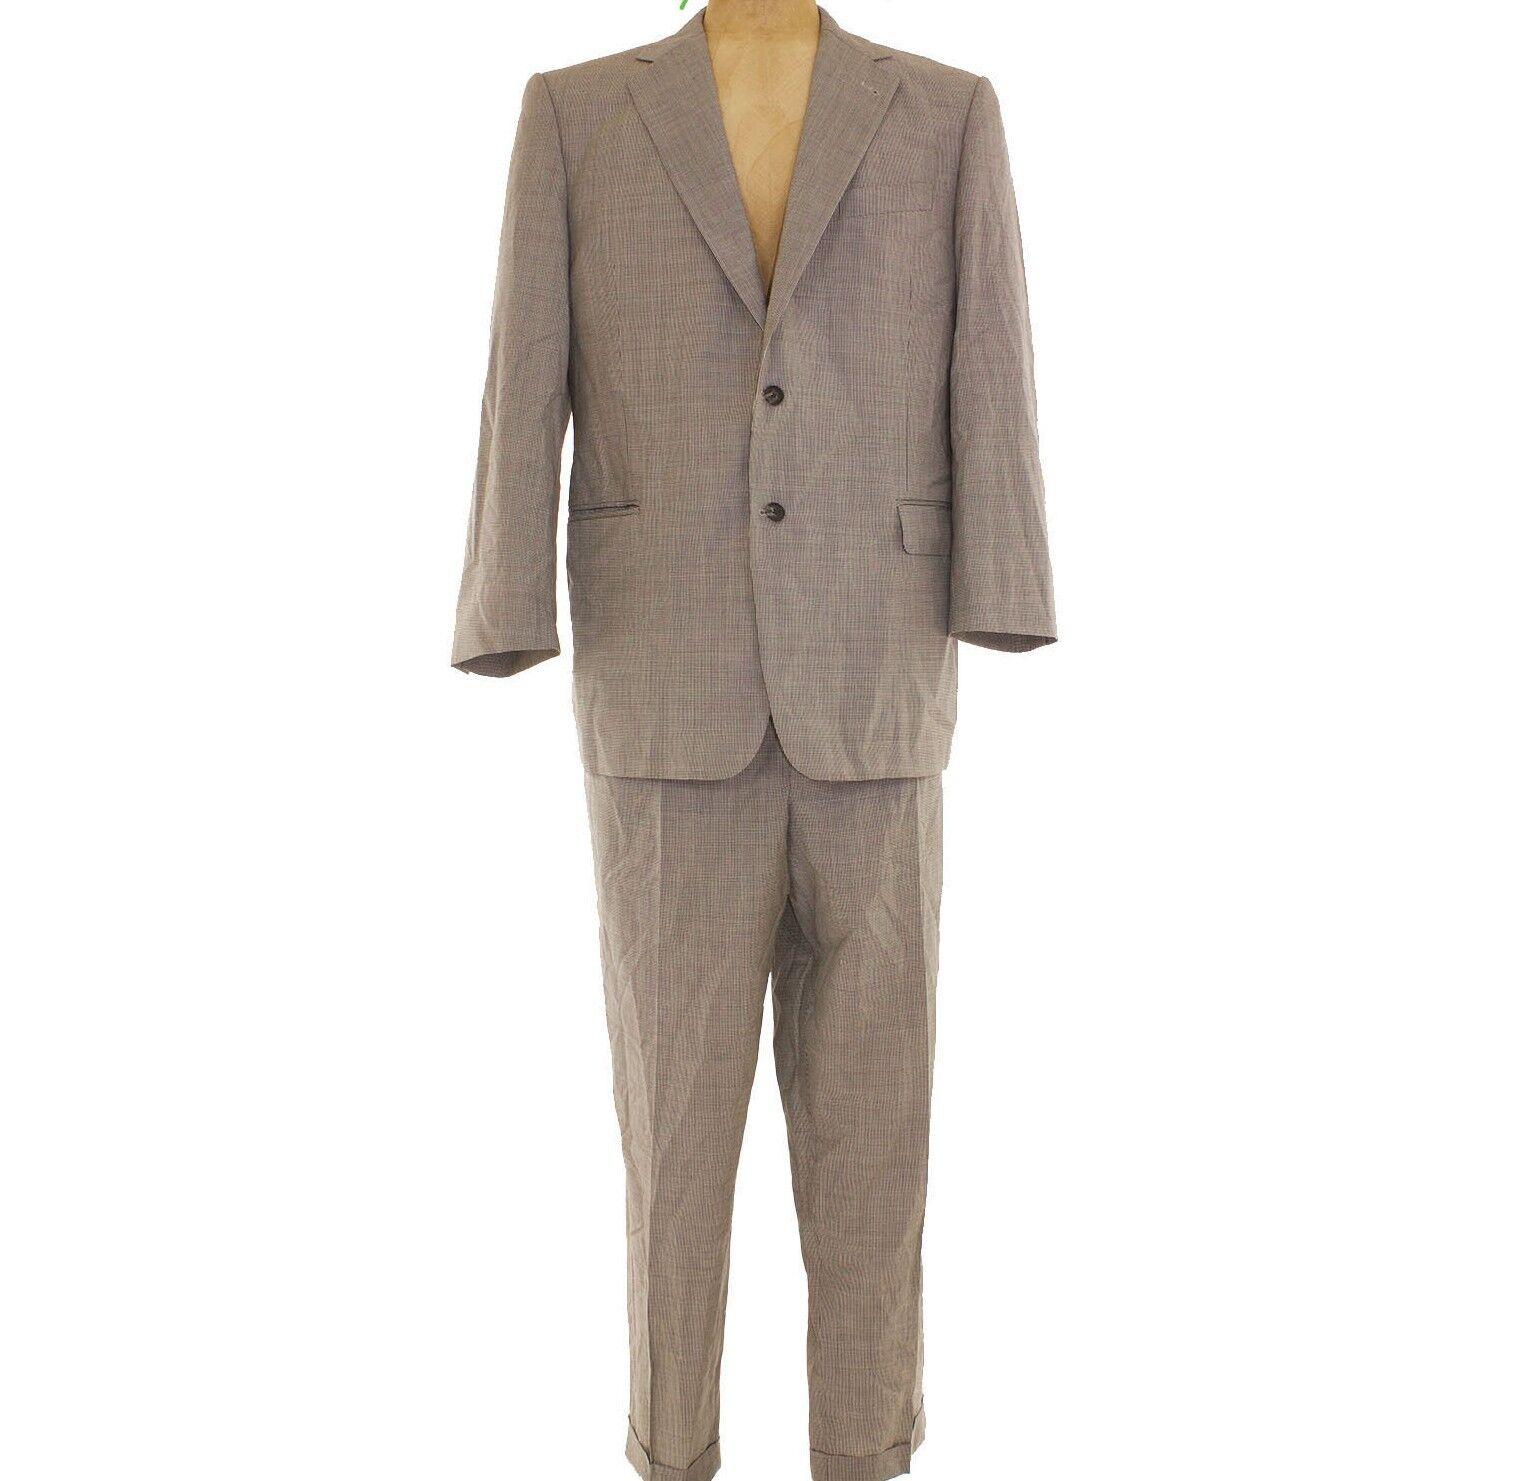 Loro Piana  Suit Coat + Trouser Pants 46L / W40 grau Mini Houndstooth B63